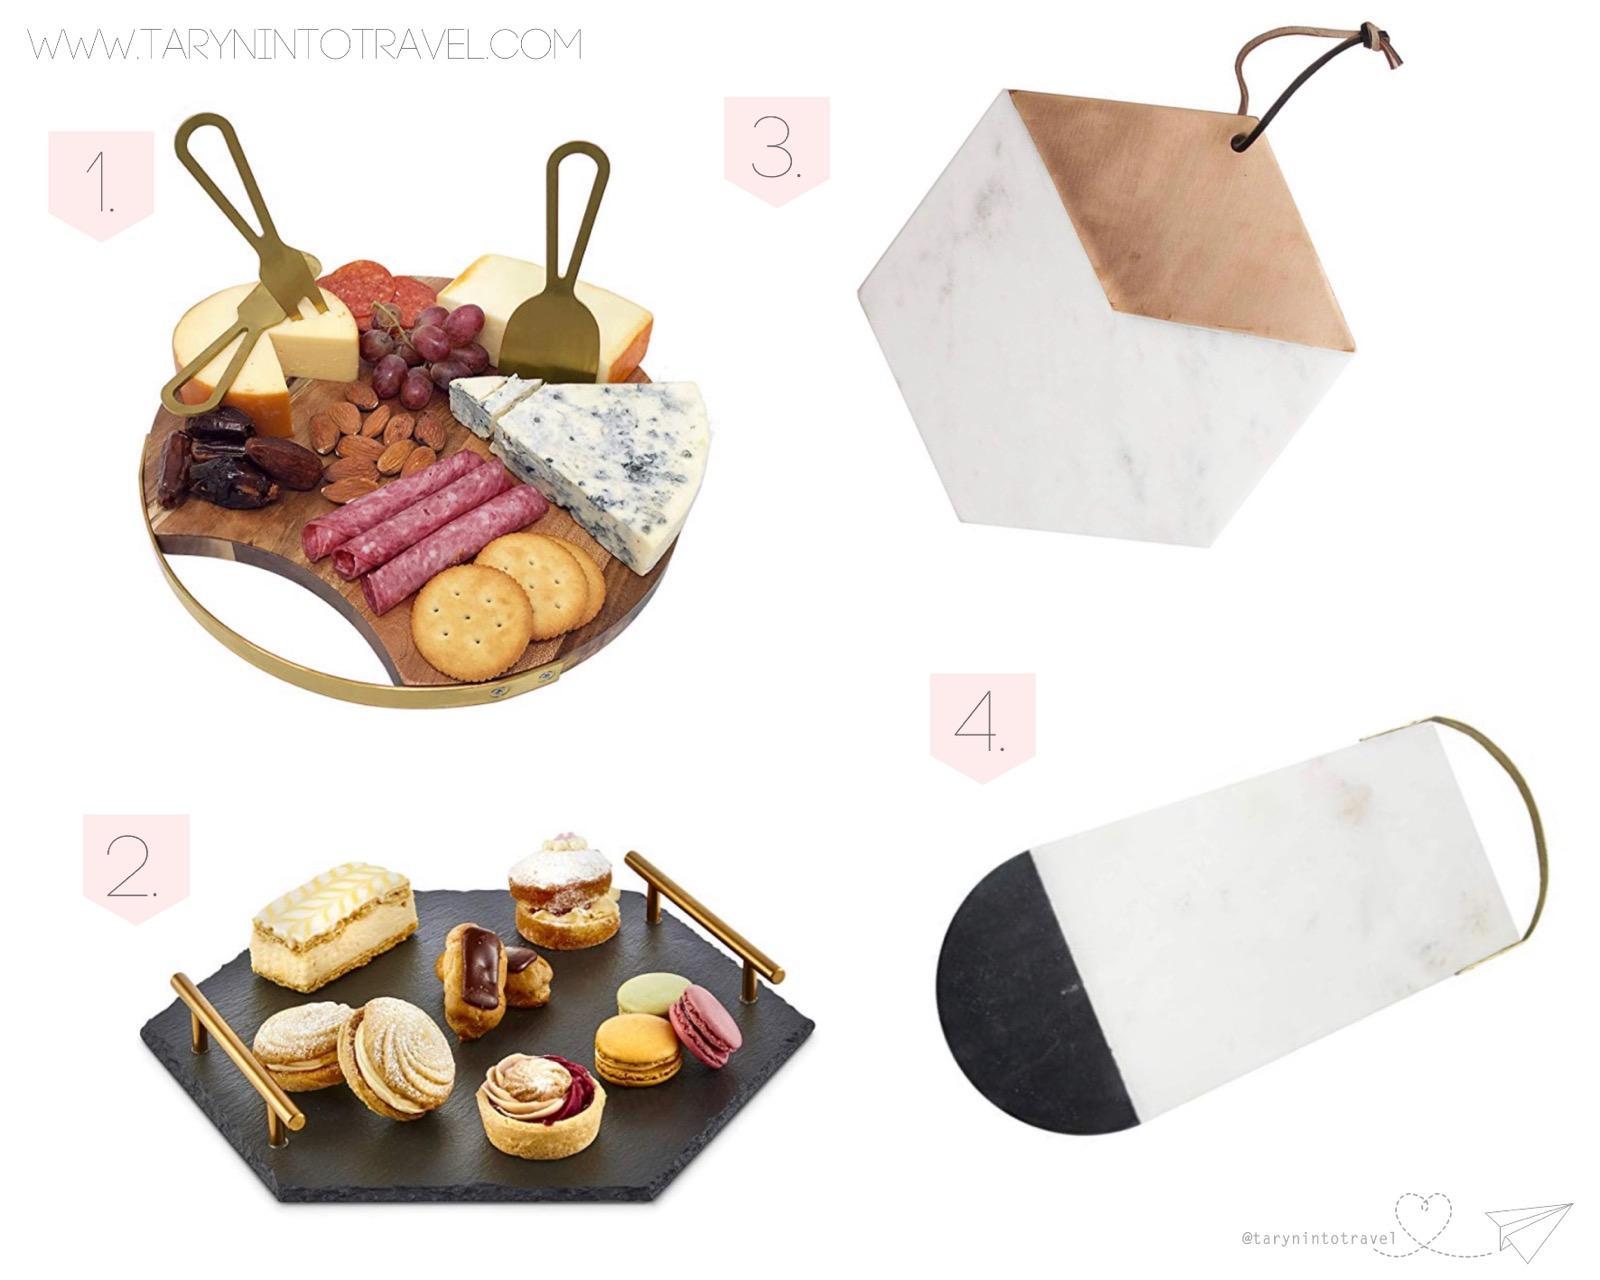 Emma Taryn Tarynintotravel Snack Board Recomendations.jpeg